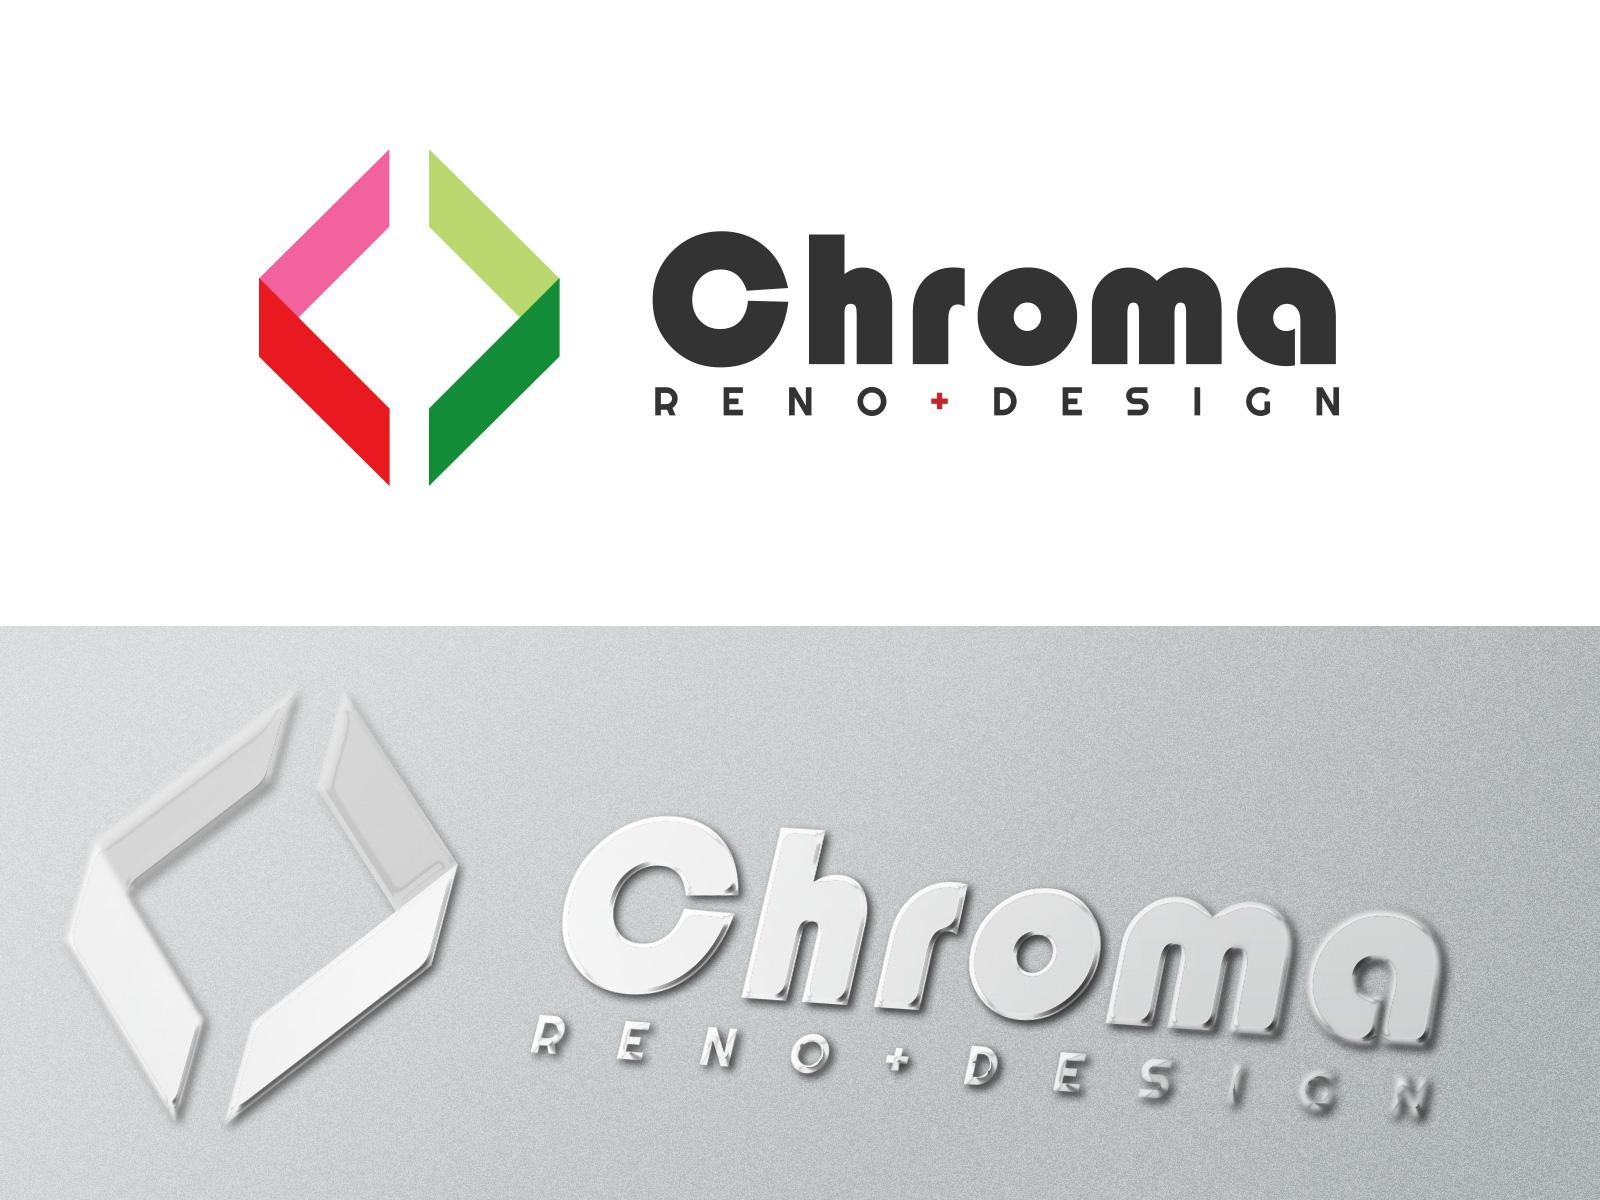 Logo Design by olii - Entry No. 169 in the Logo Design Contest Inspiring Logo Design for Chroma Reno+Design.